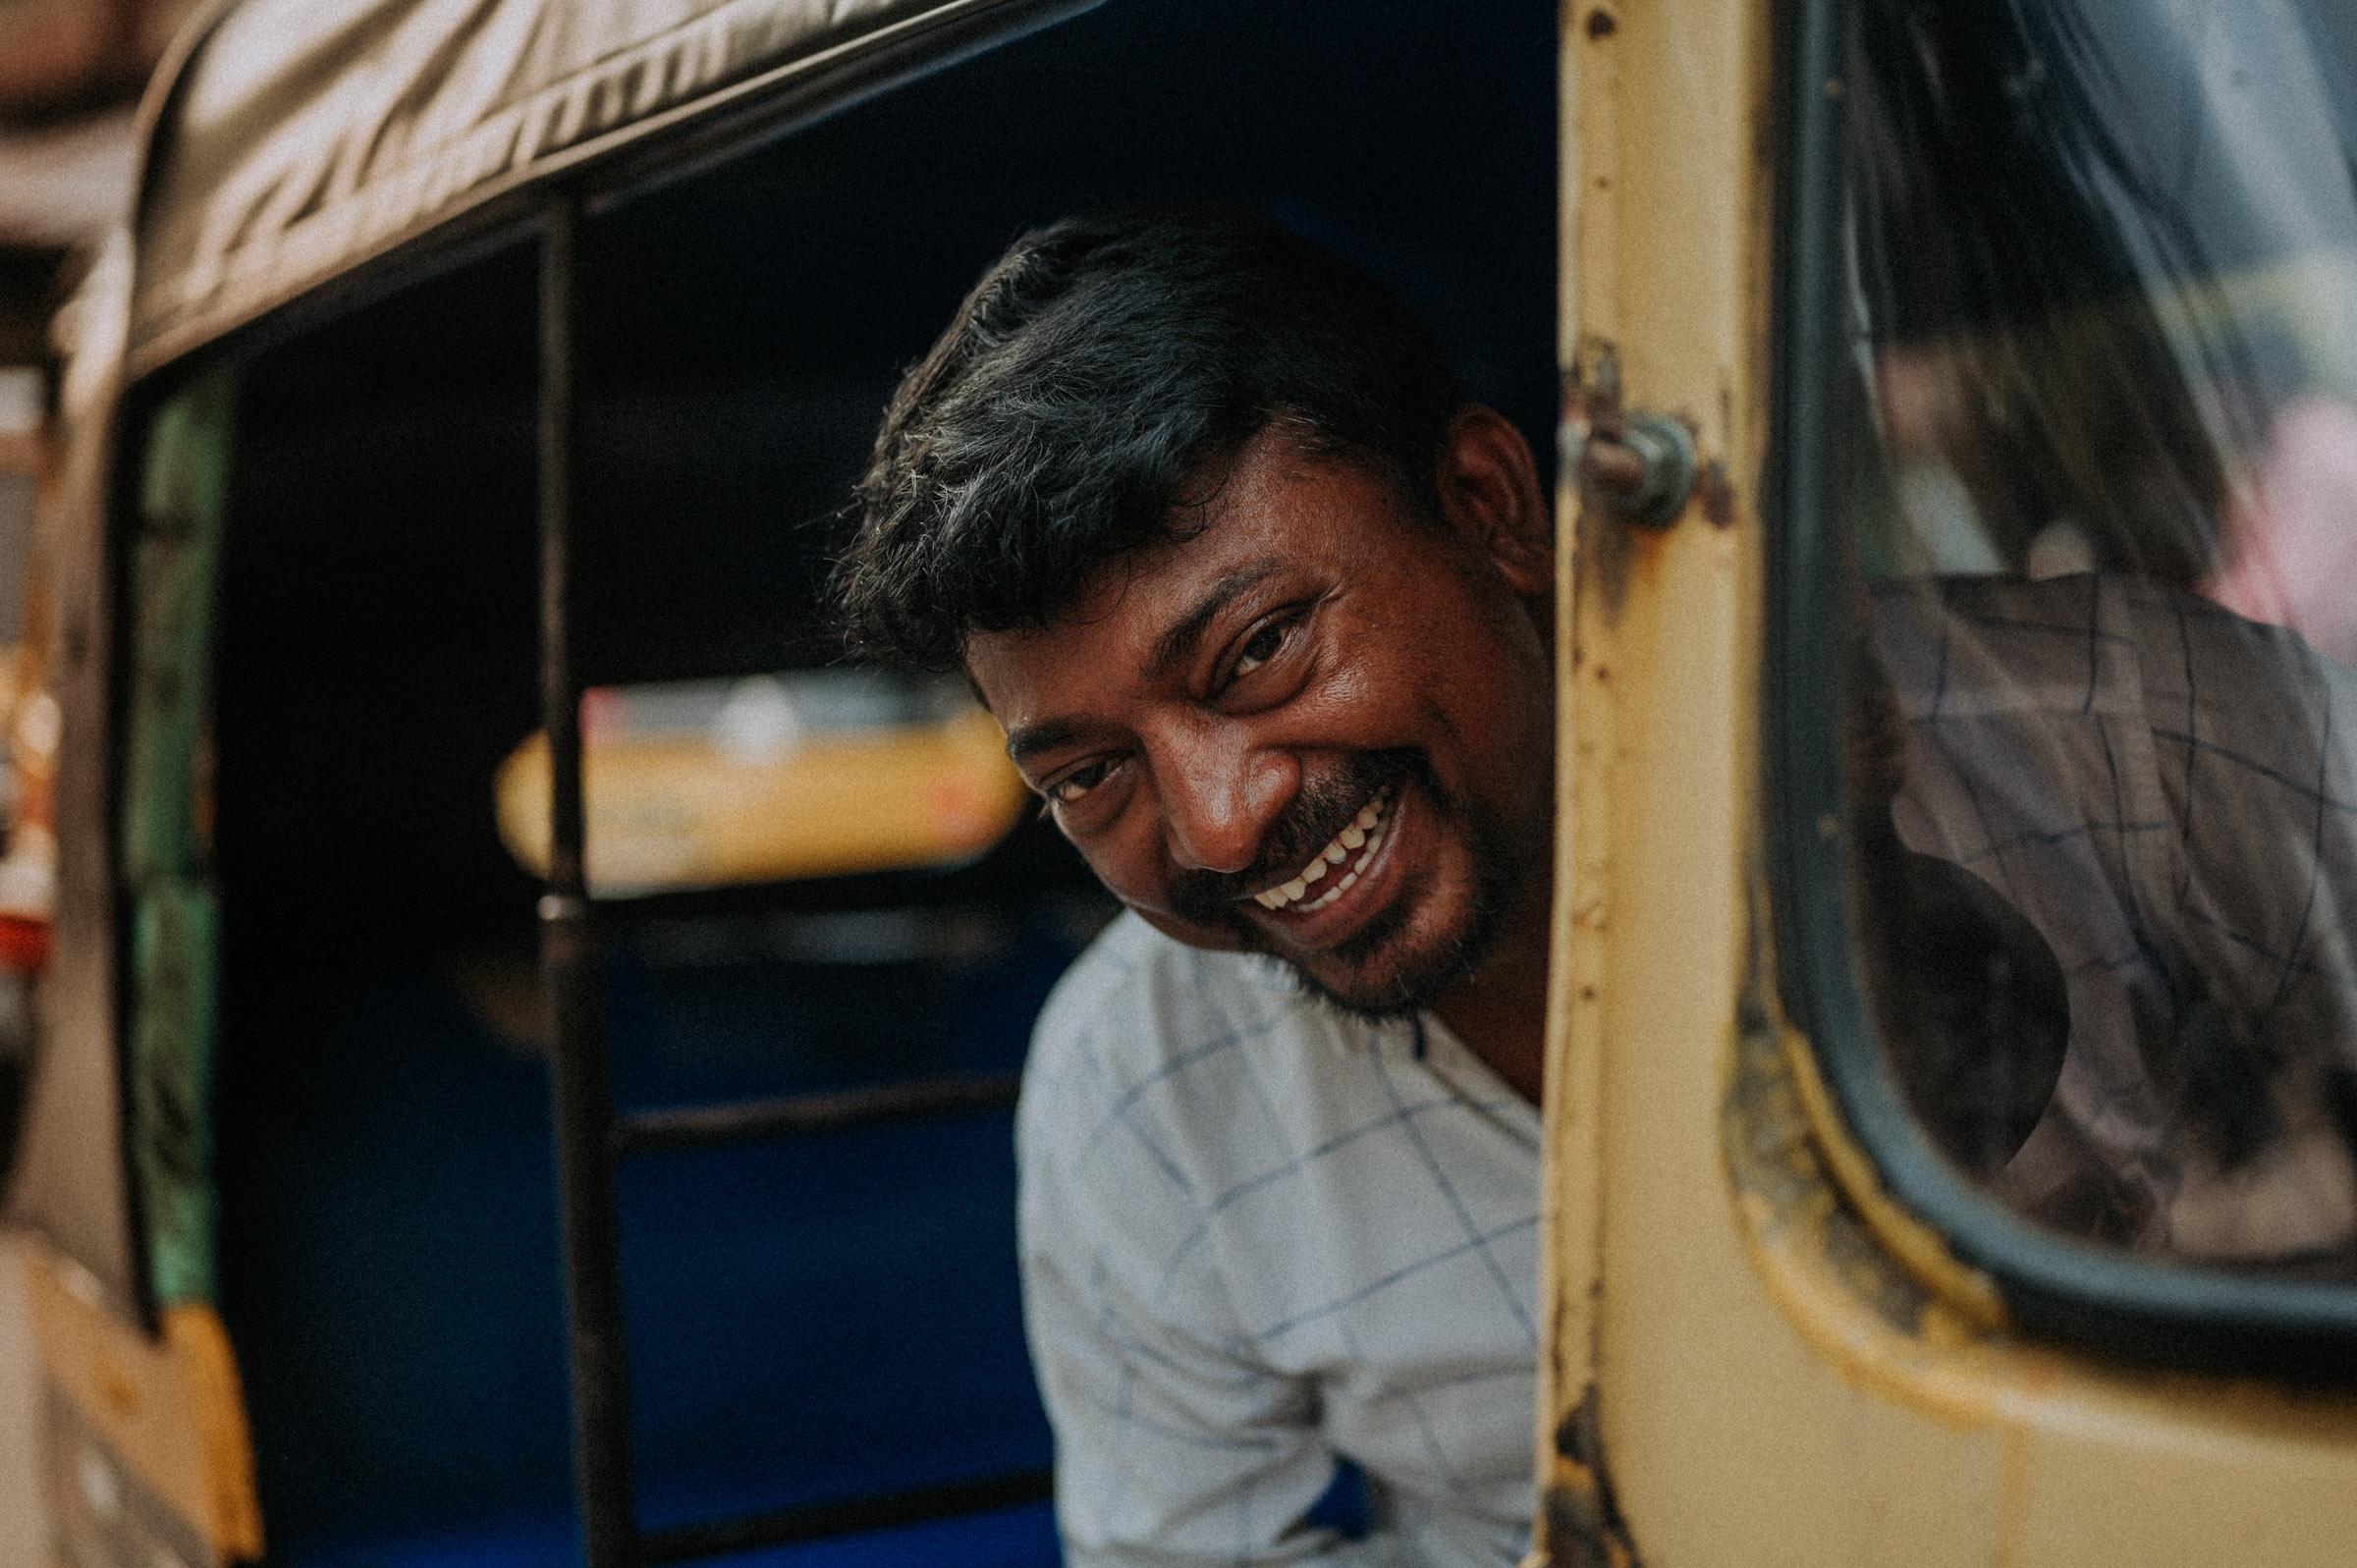 Rikschafahrer in Mumbai und Bombay